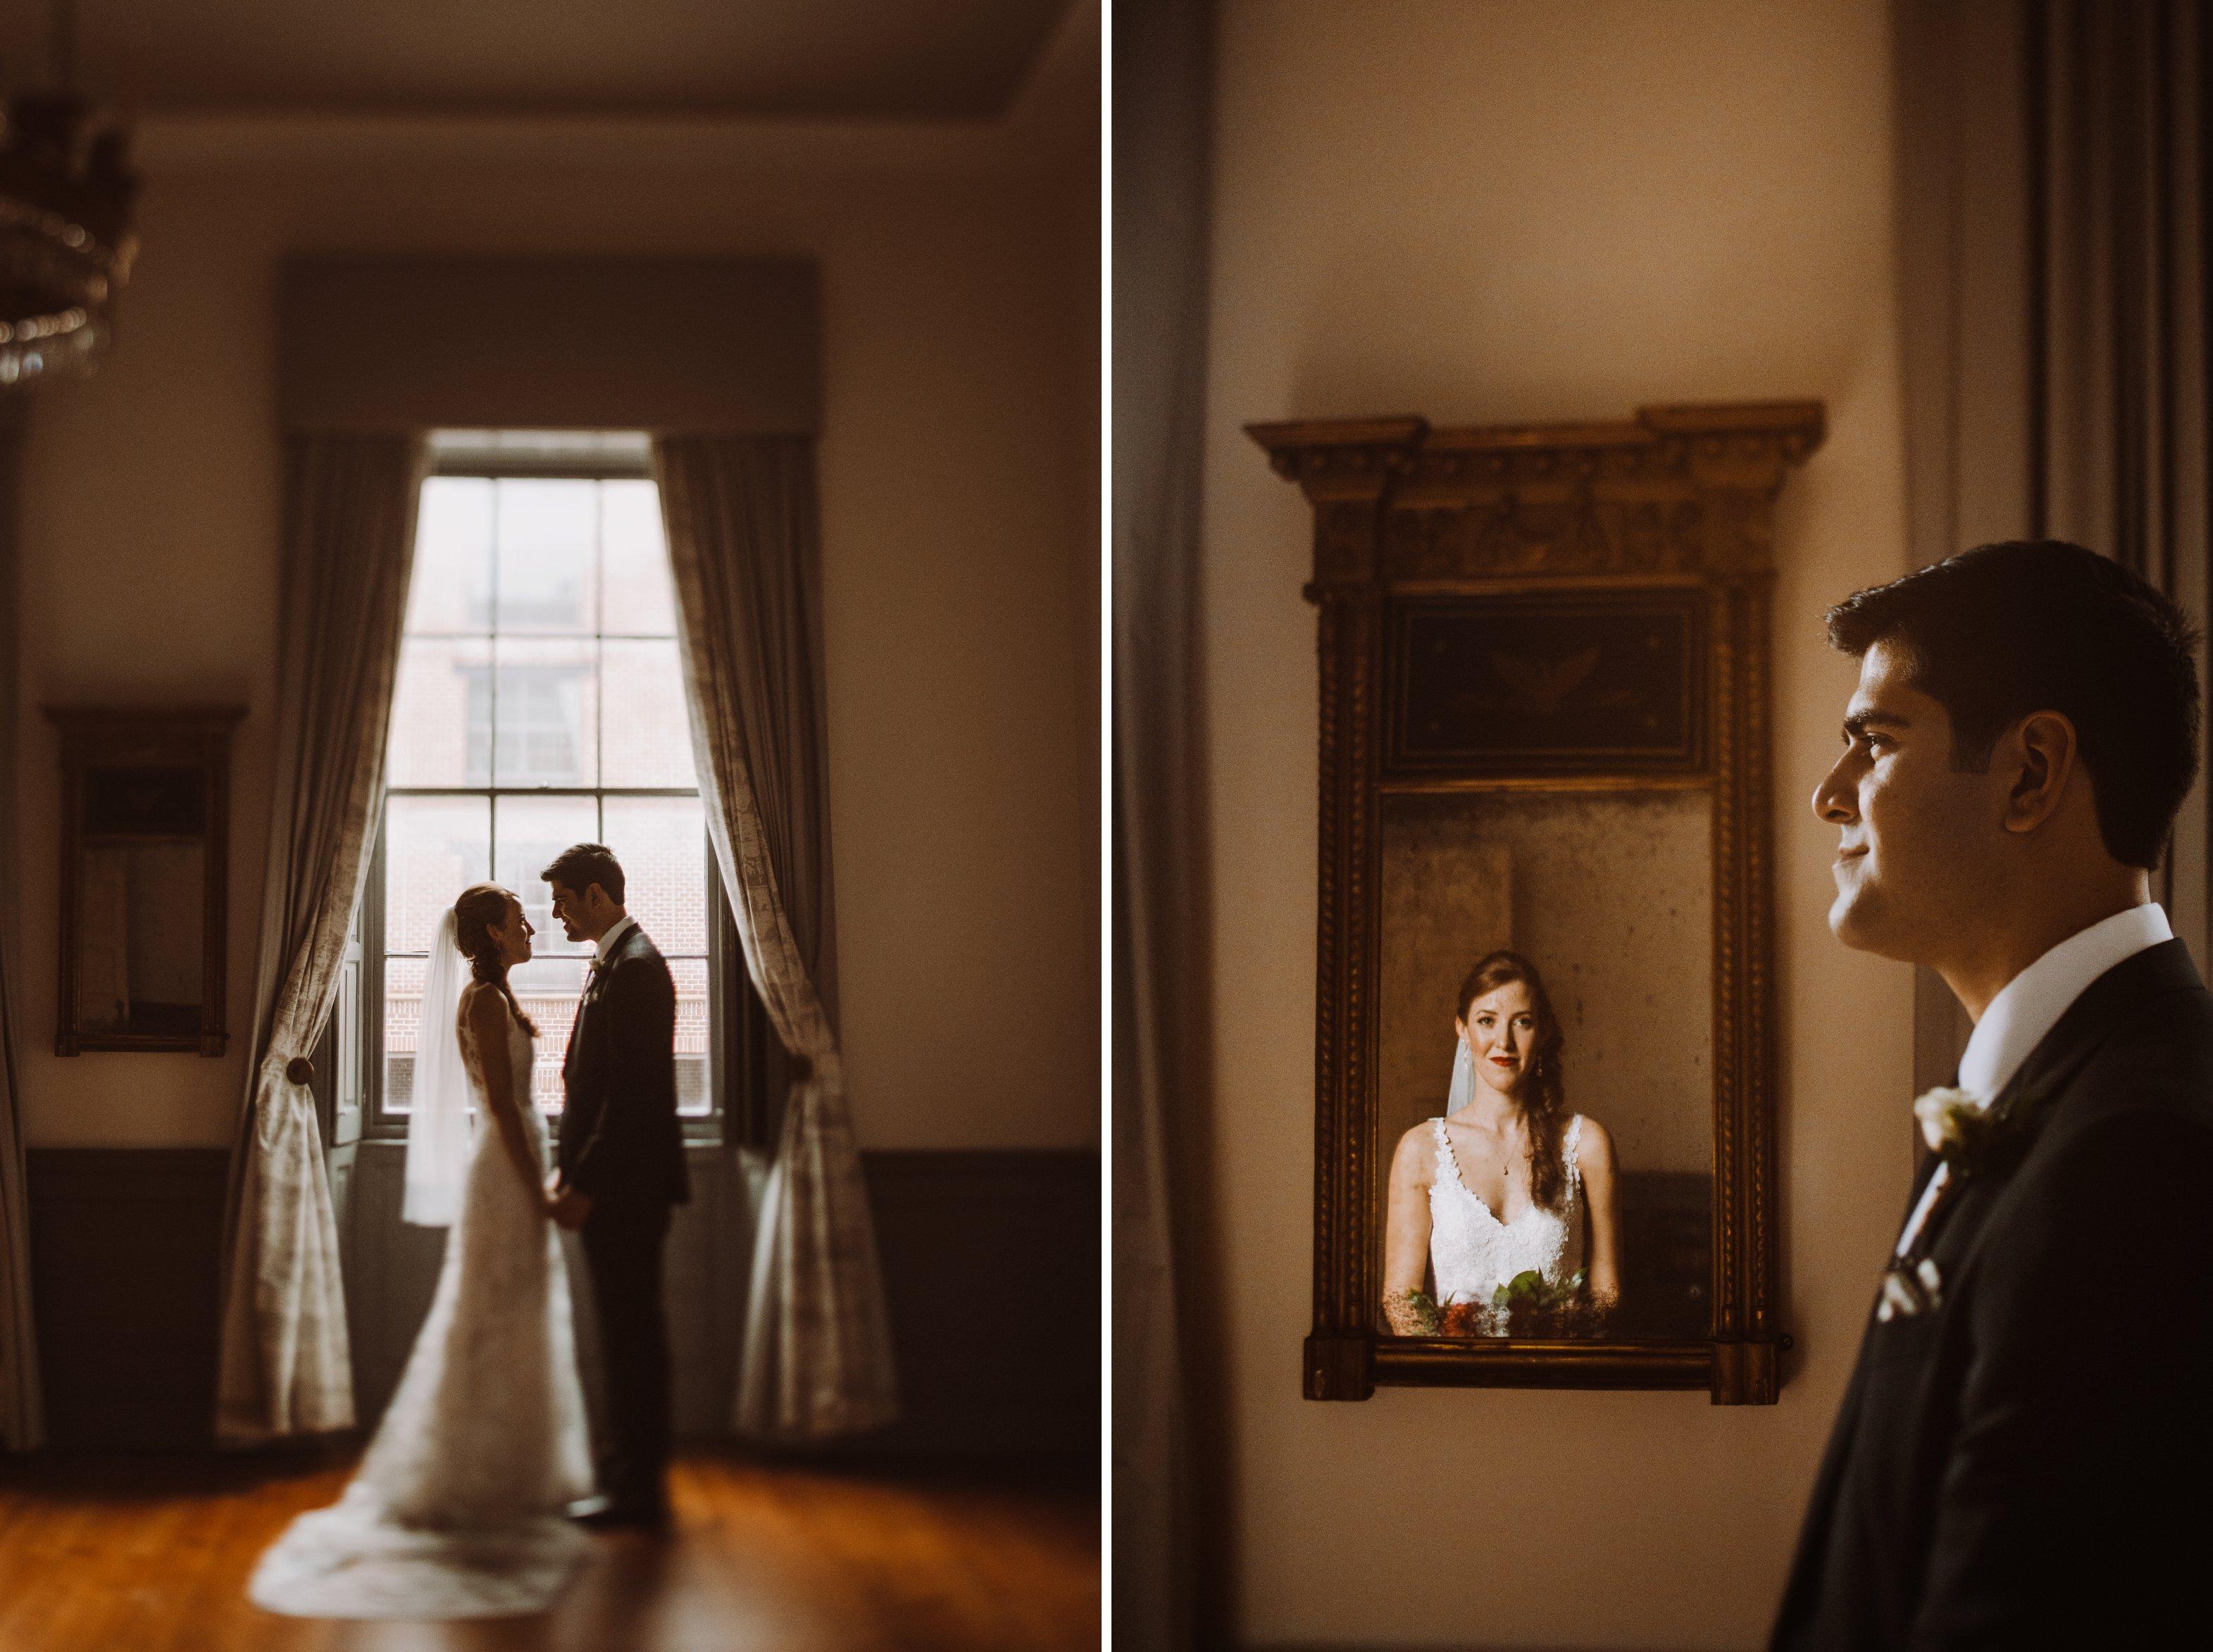 bride and groom portraits 1840s Ballroom Baltimore Maryland wedding photographer